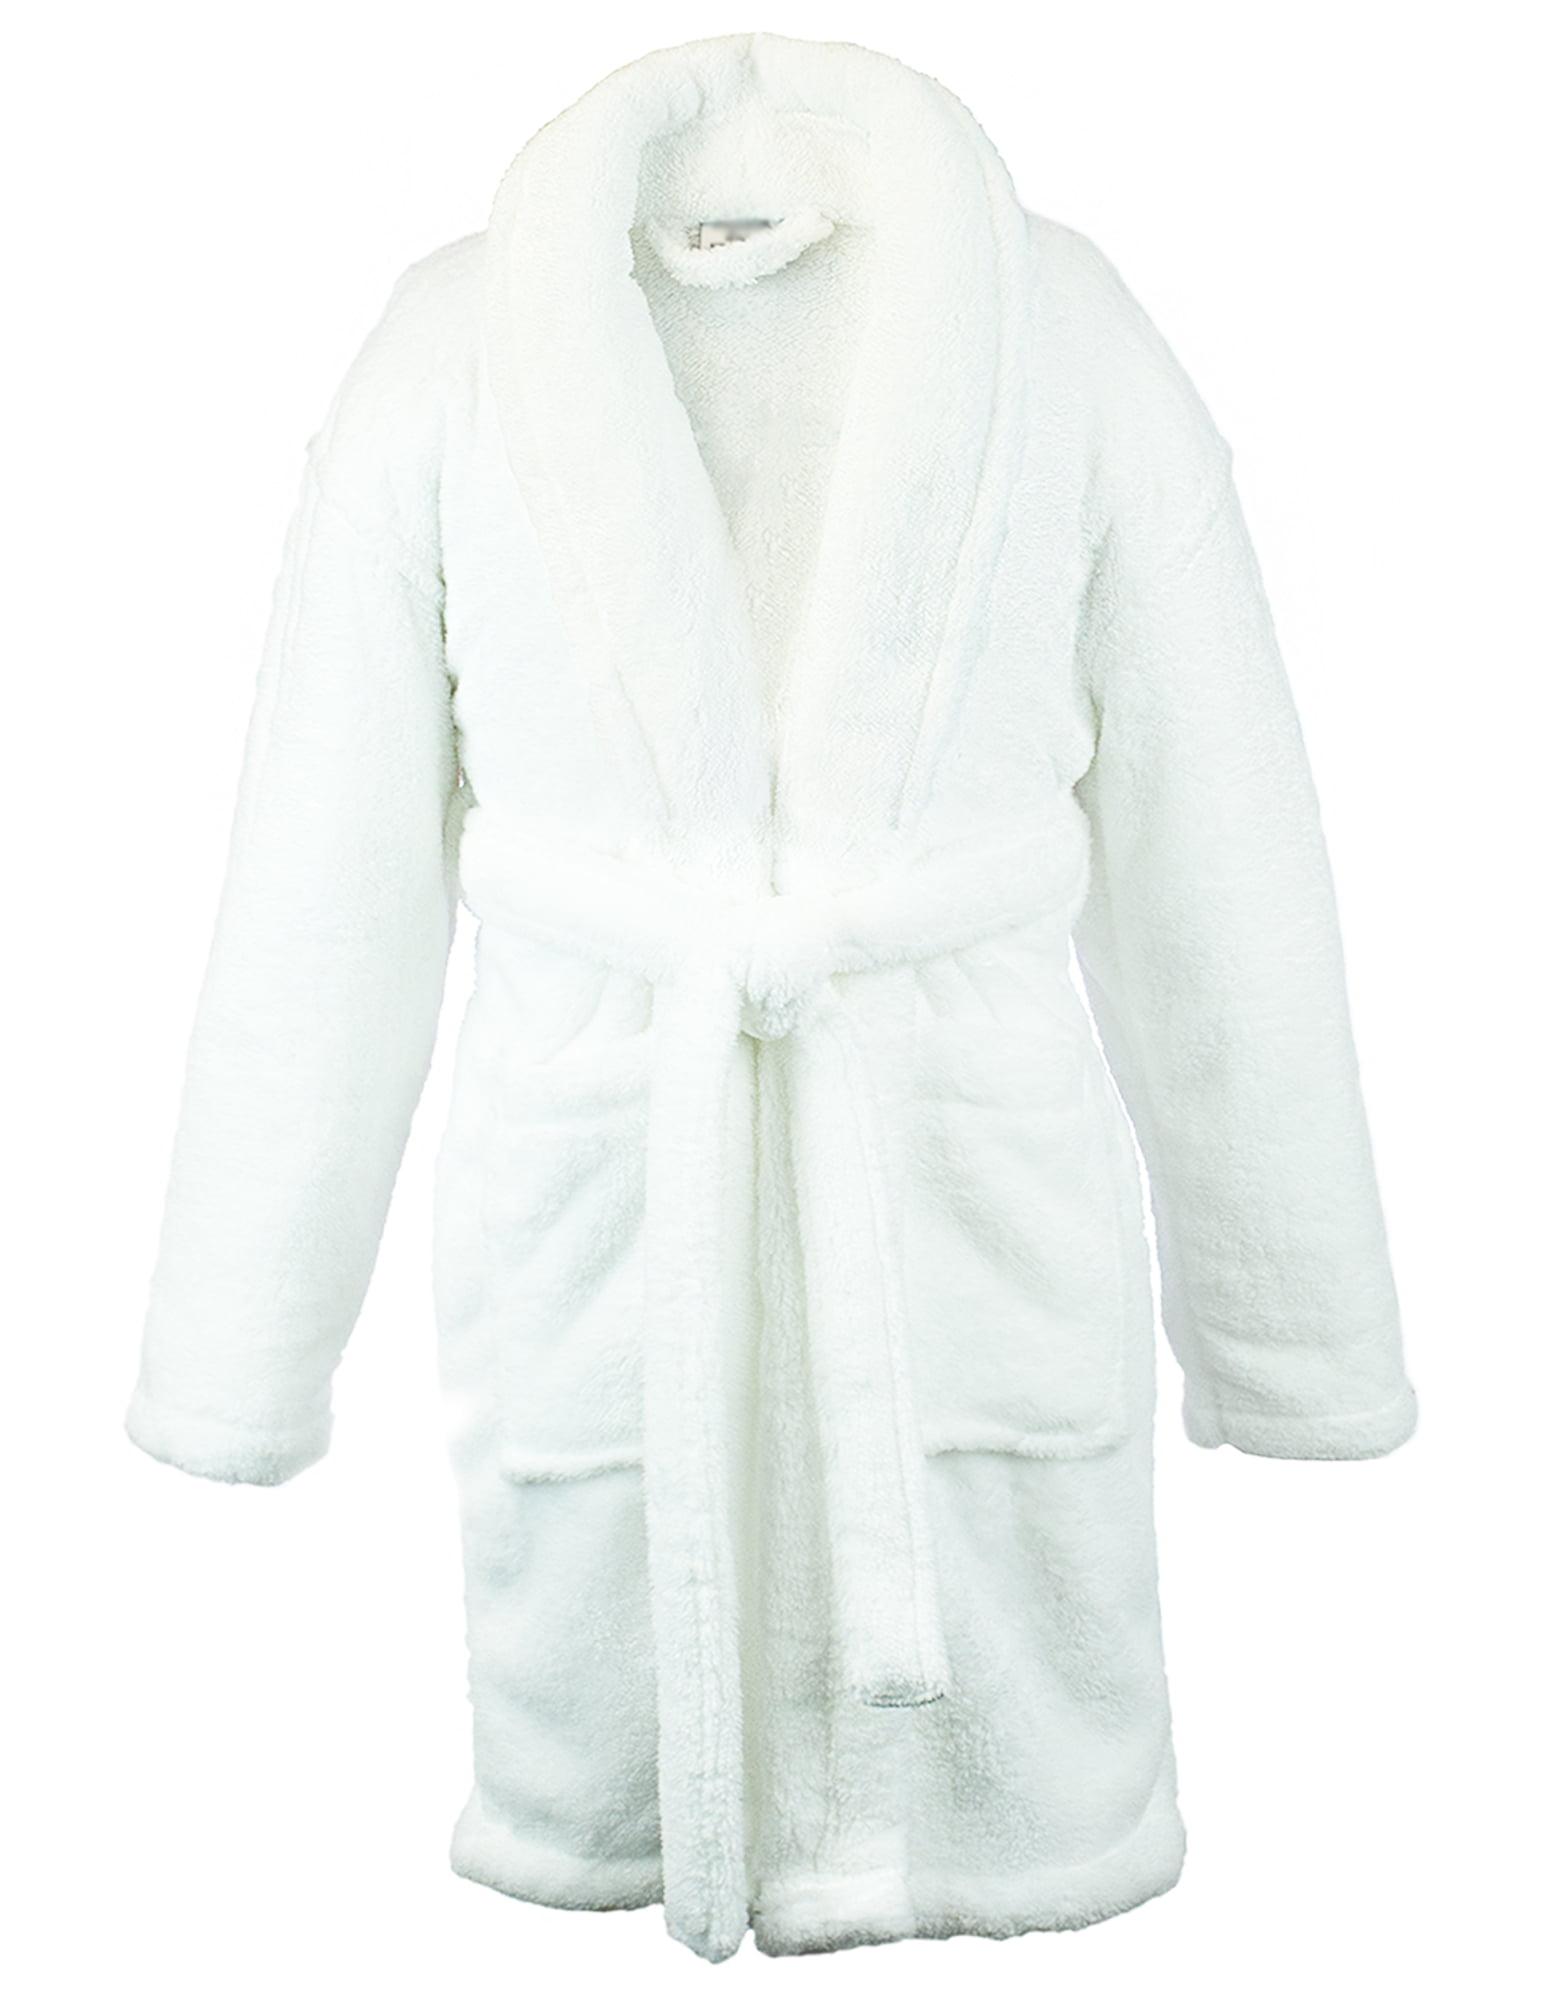 Kids Microfiber Fleece Shawl Robe - Boys - White - Small